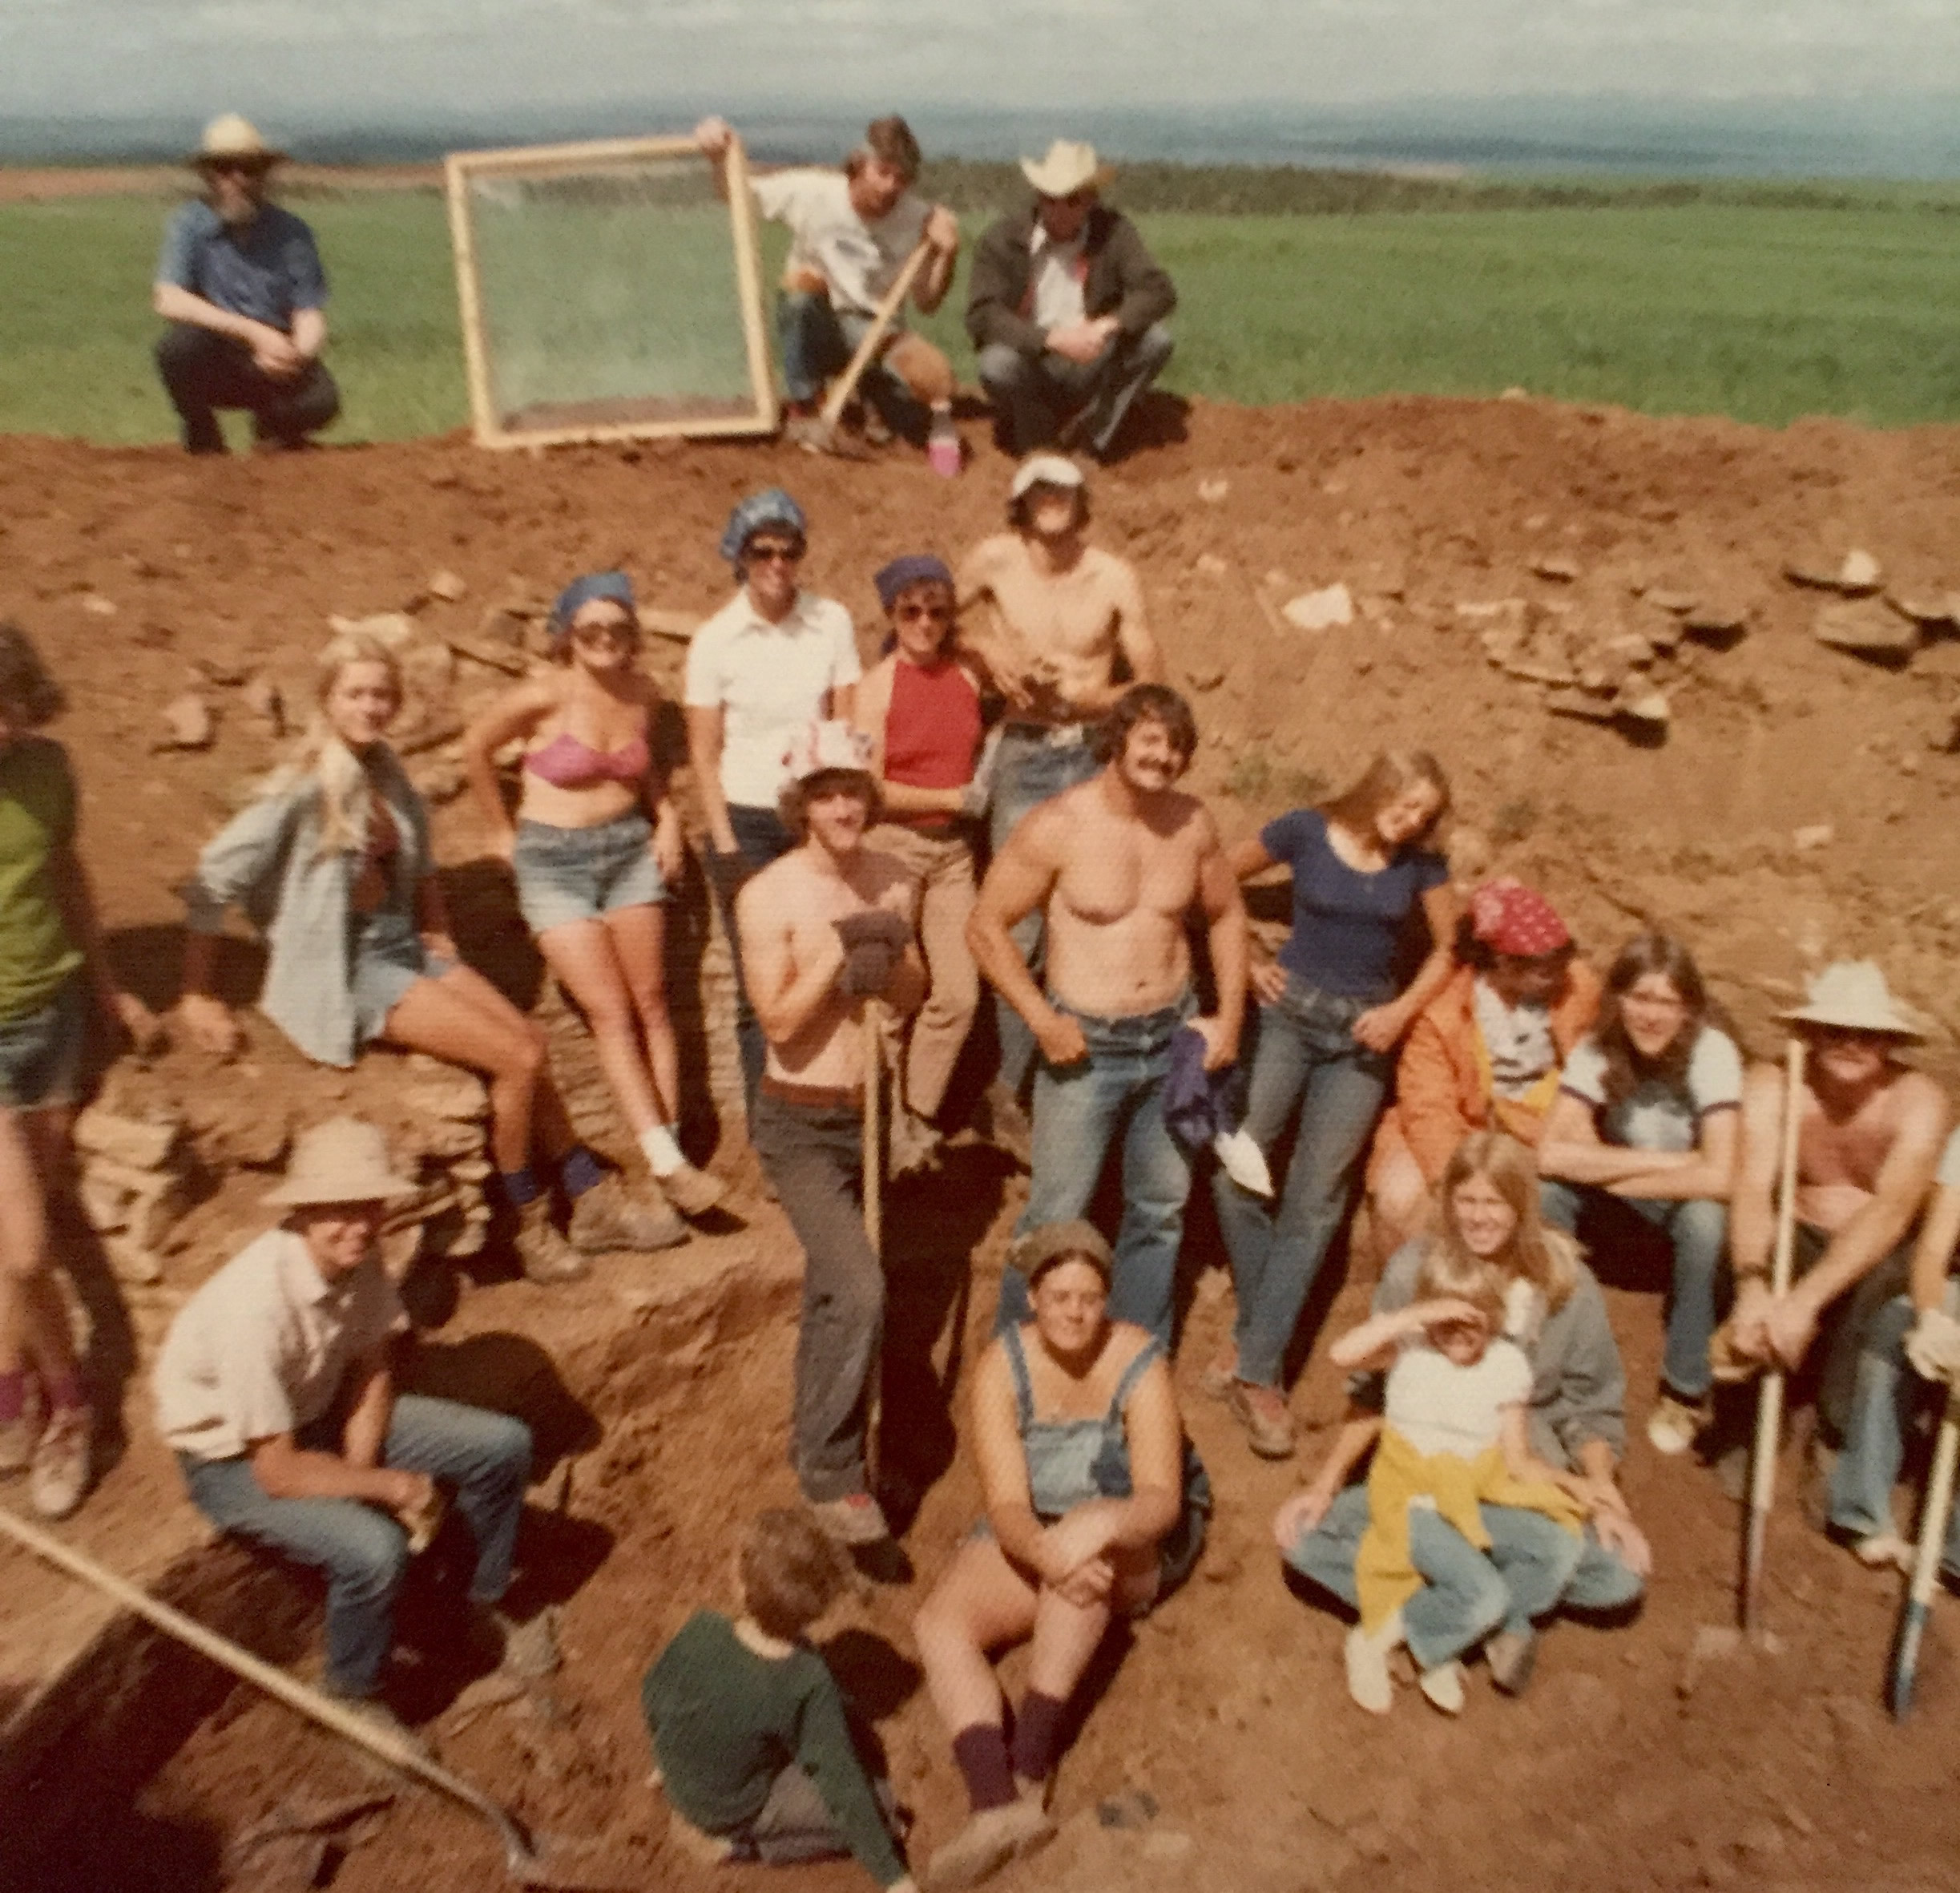 Photo: A dig site.